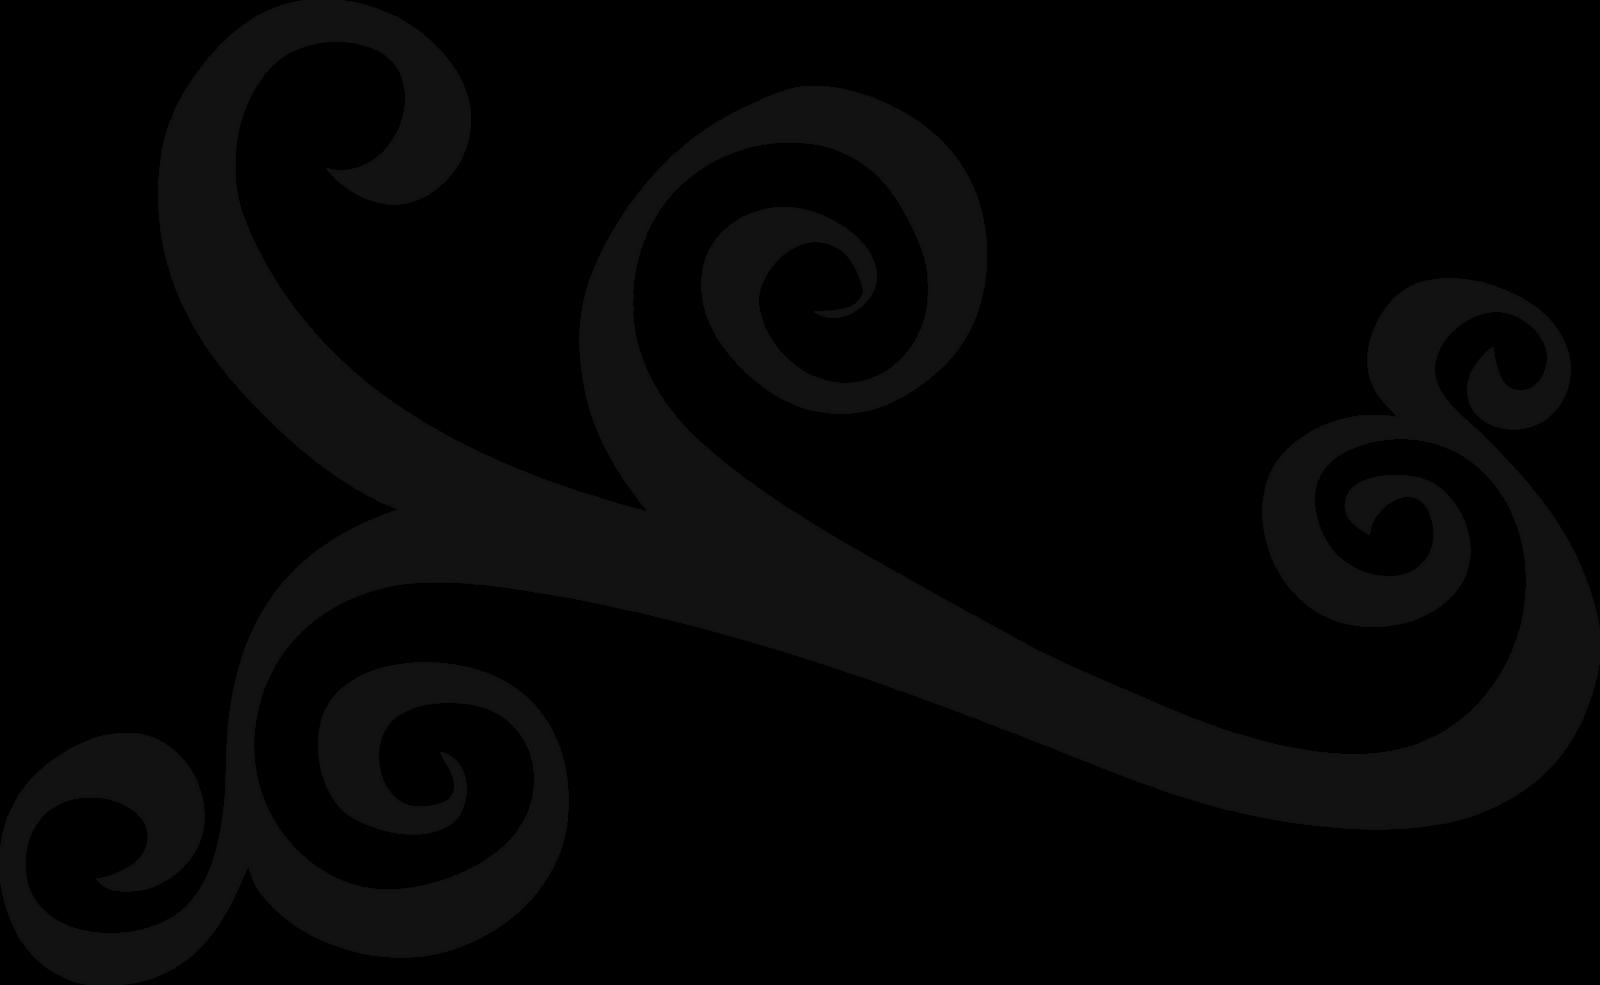 Black Swirls Clipart   Clipart Panda - Free Clipart Images